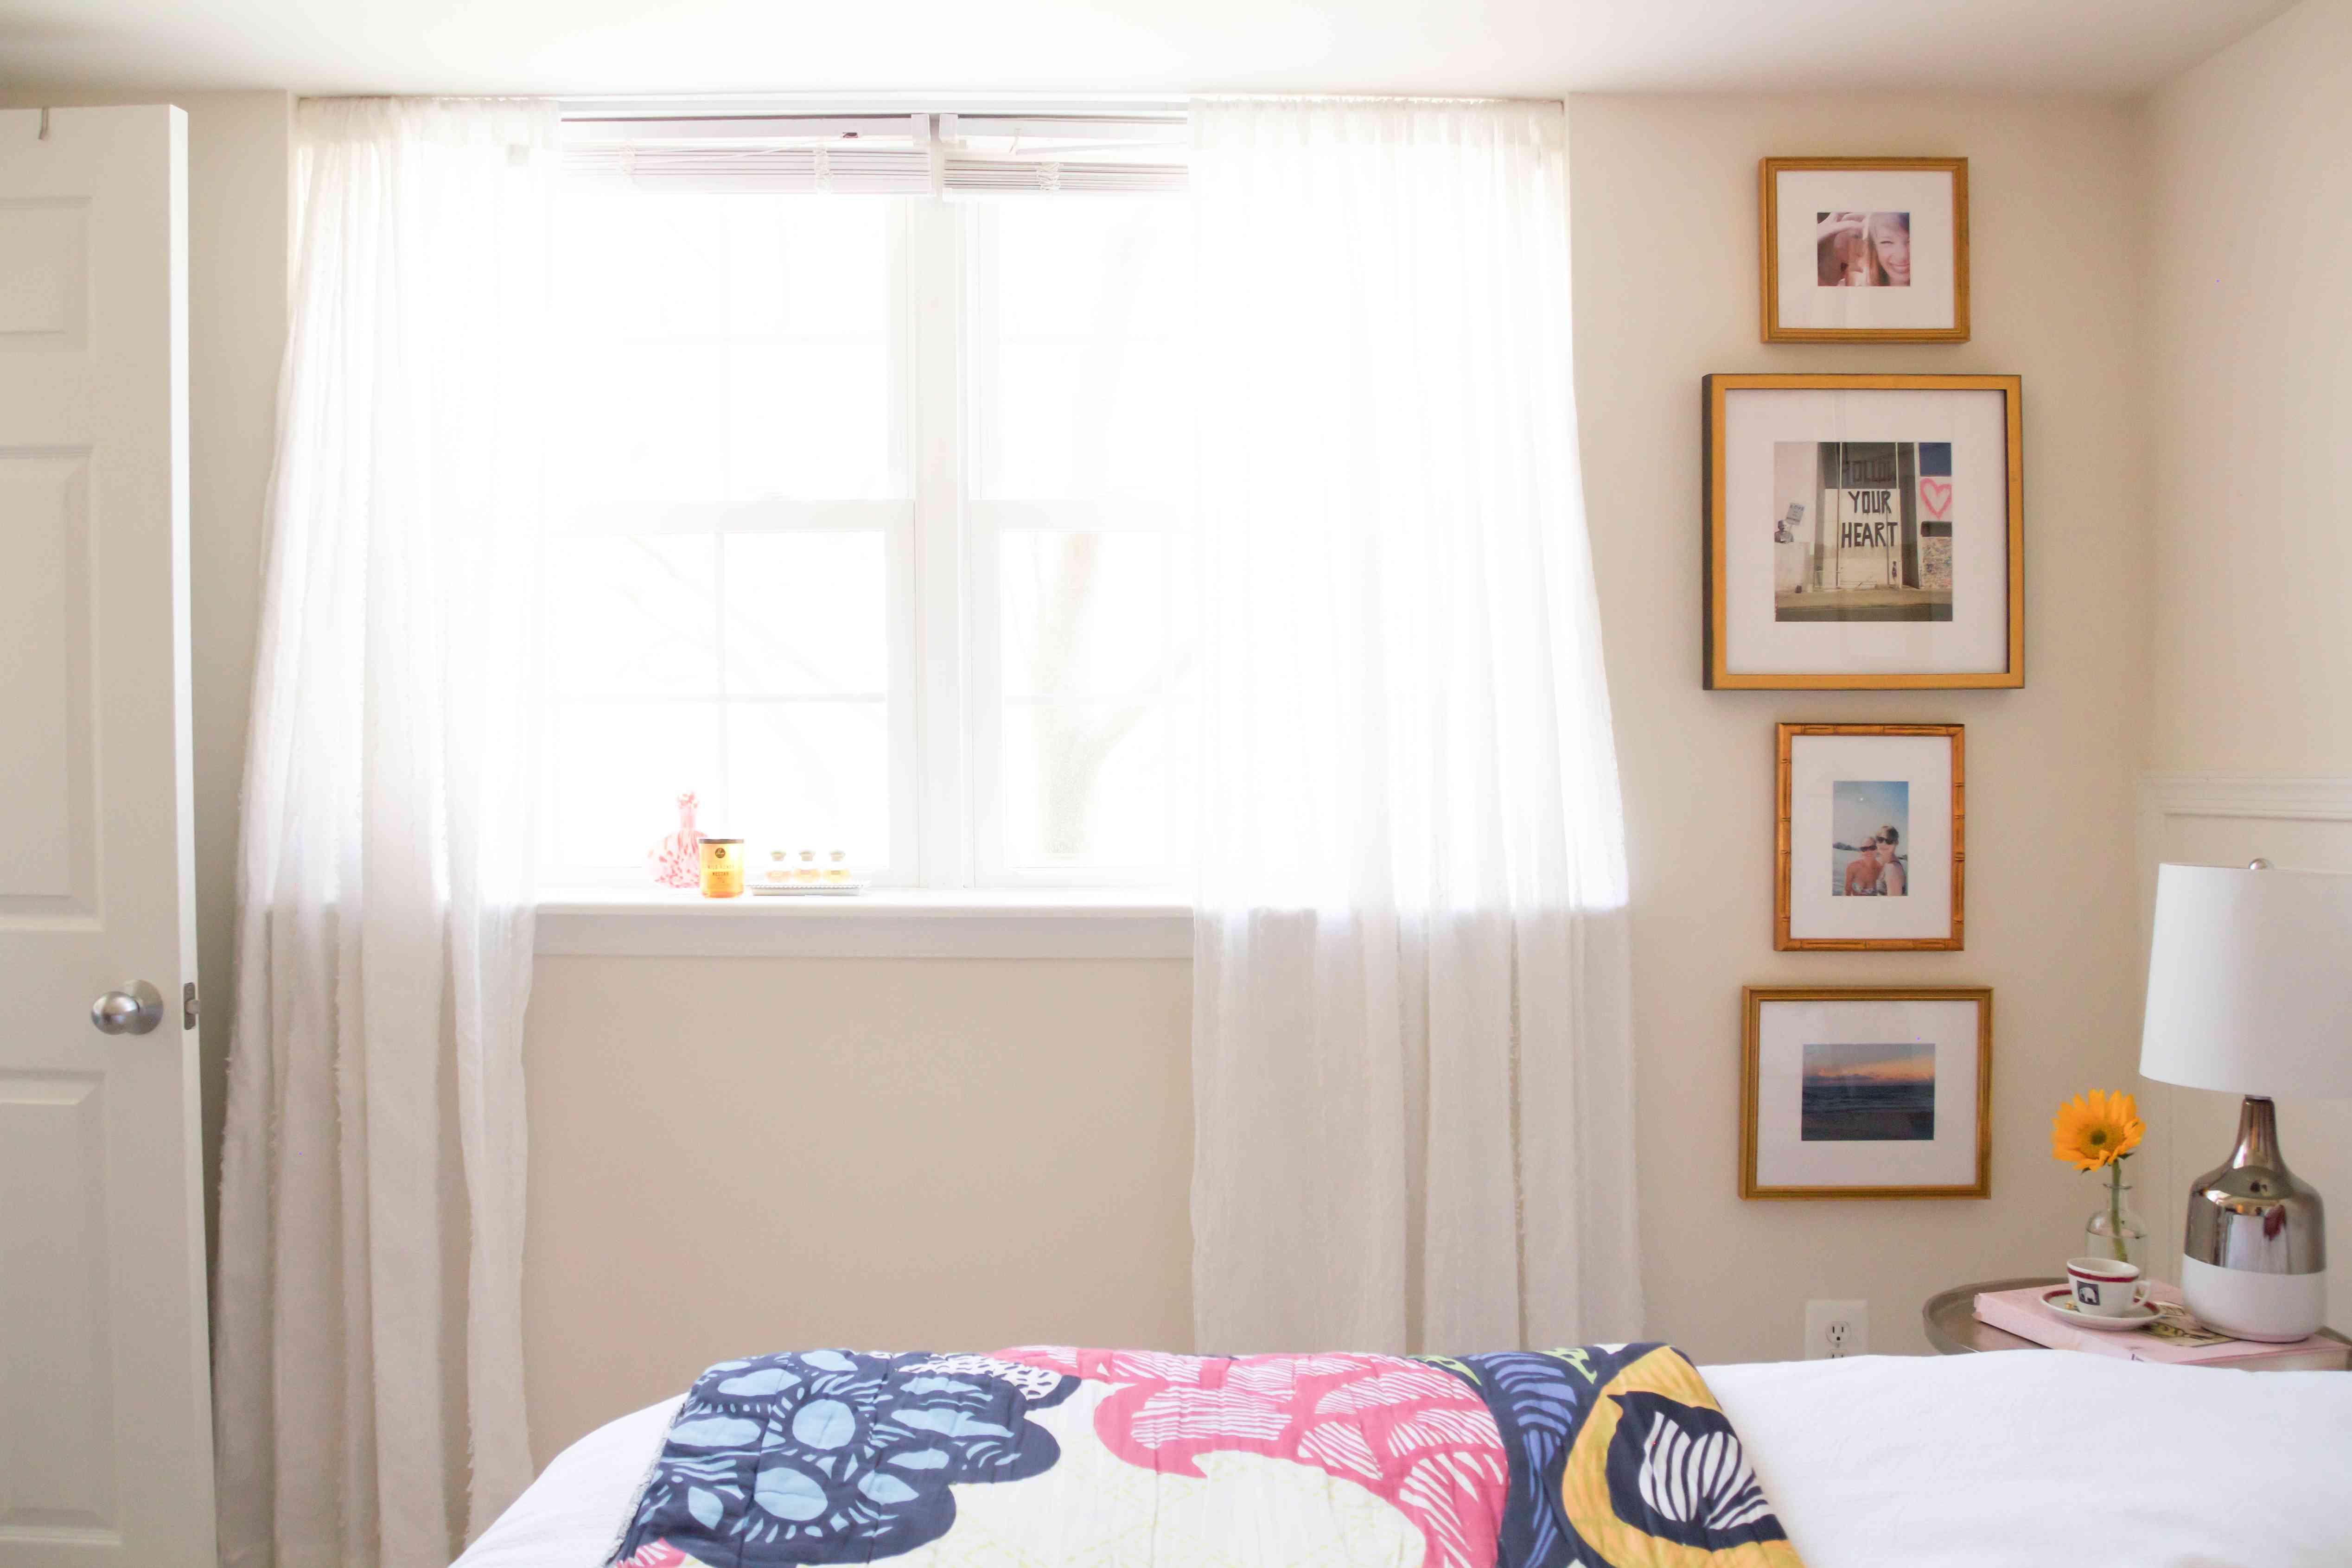 Framed photos in vertical lineup beside a window in bedroom.